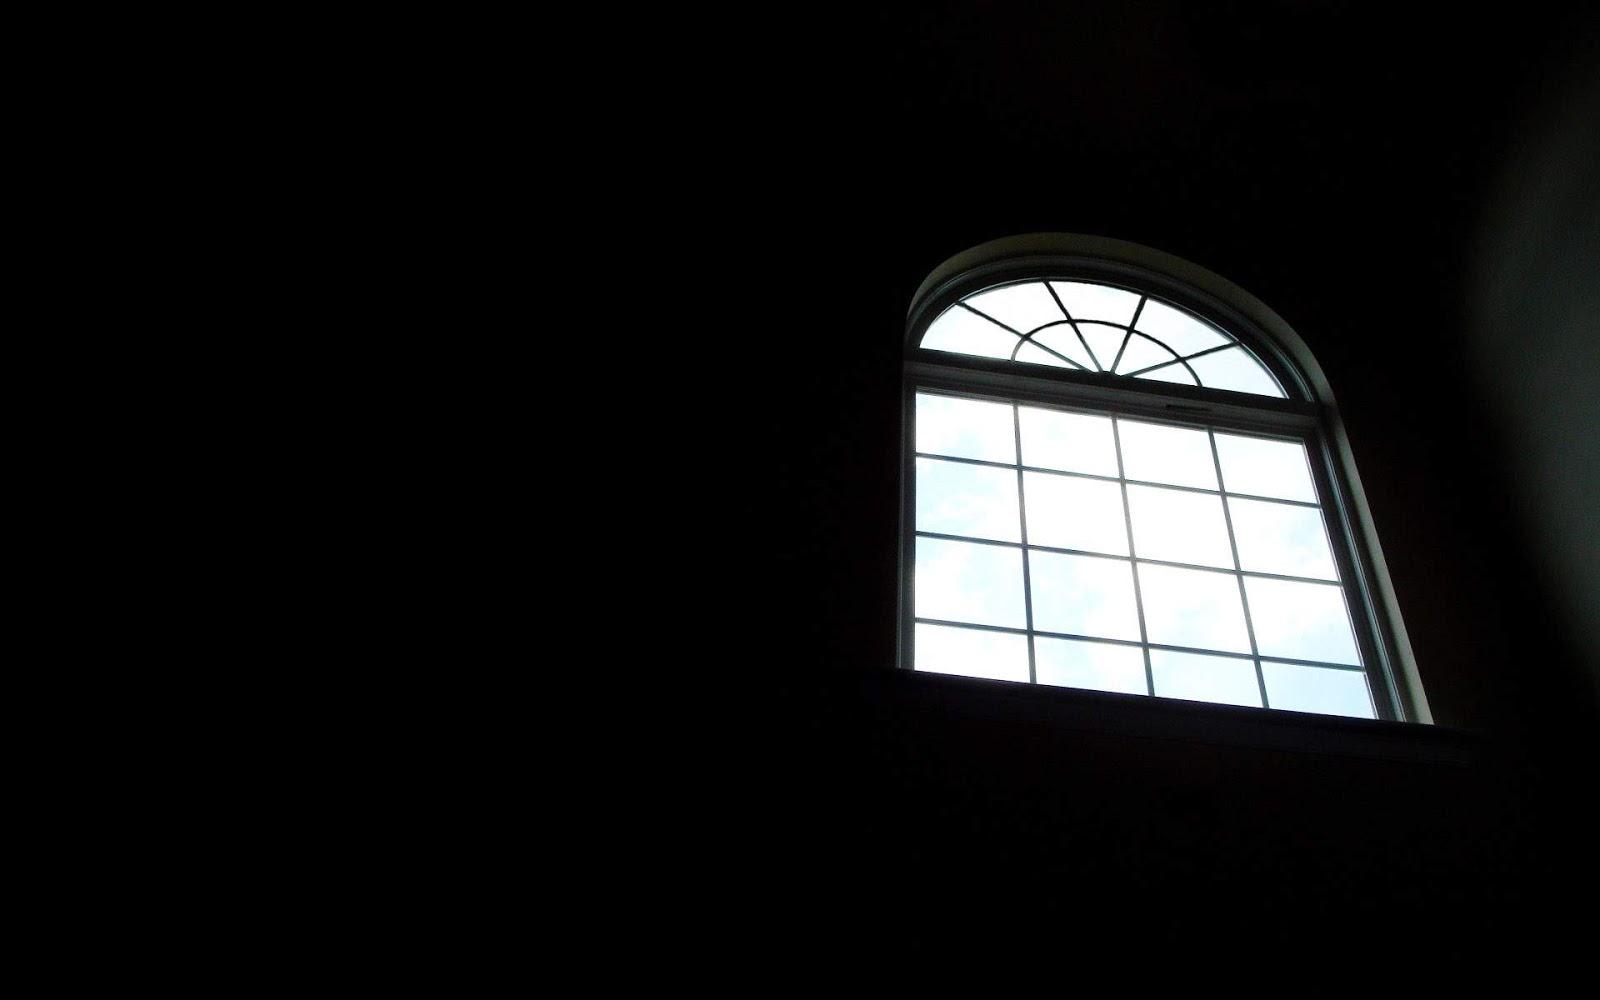 http://1.bp.blogspot.com/-evktPqnIZdY/UI6lkB7dvsI/AAAAAAAABFo/hwZd6cs9J7Q/s1600/White-window-on-black-background-black-and-white-wallpaper-d-widescreen.jpg